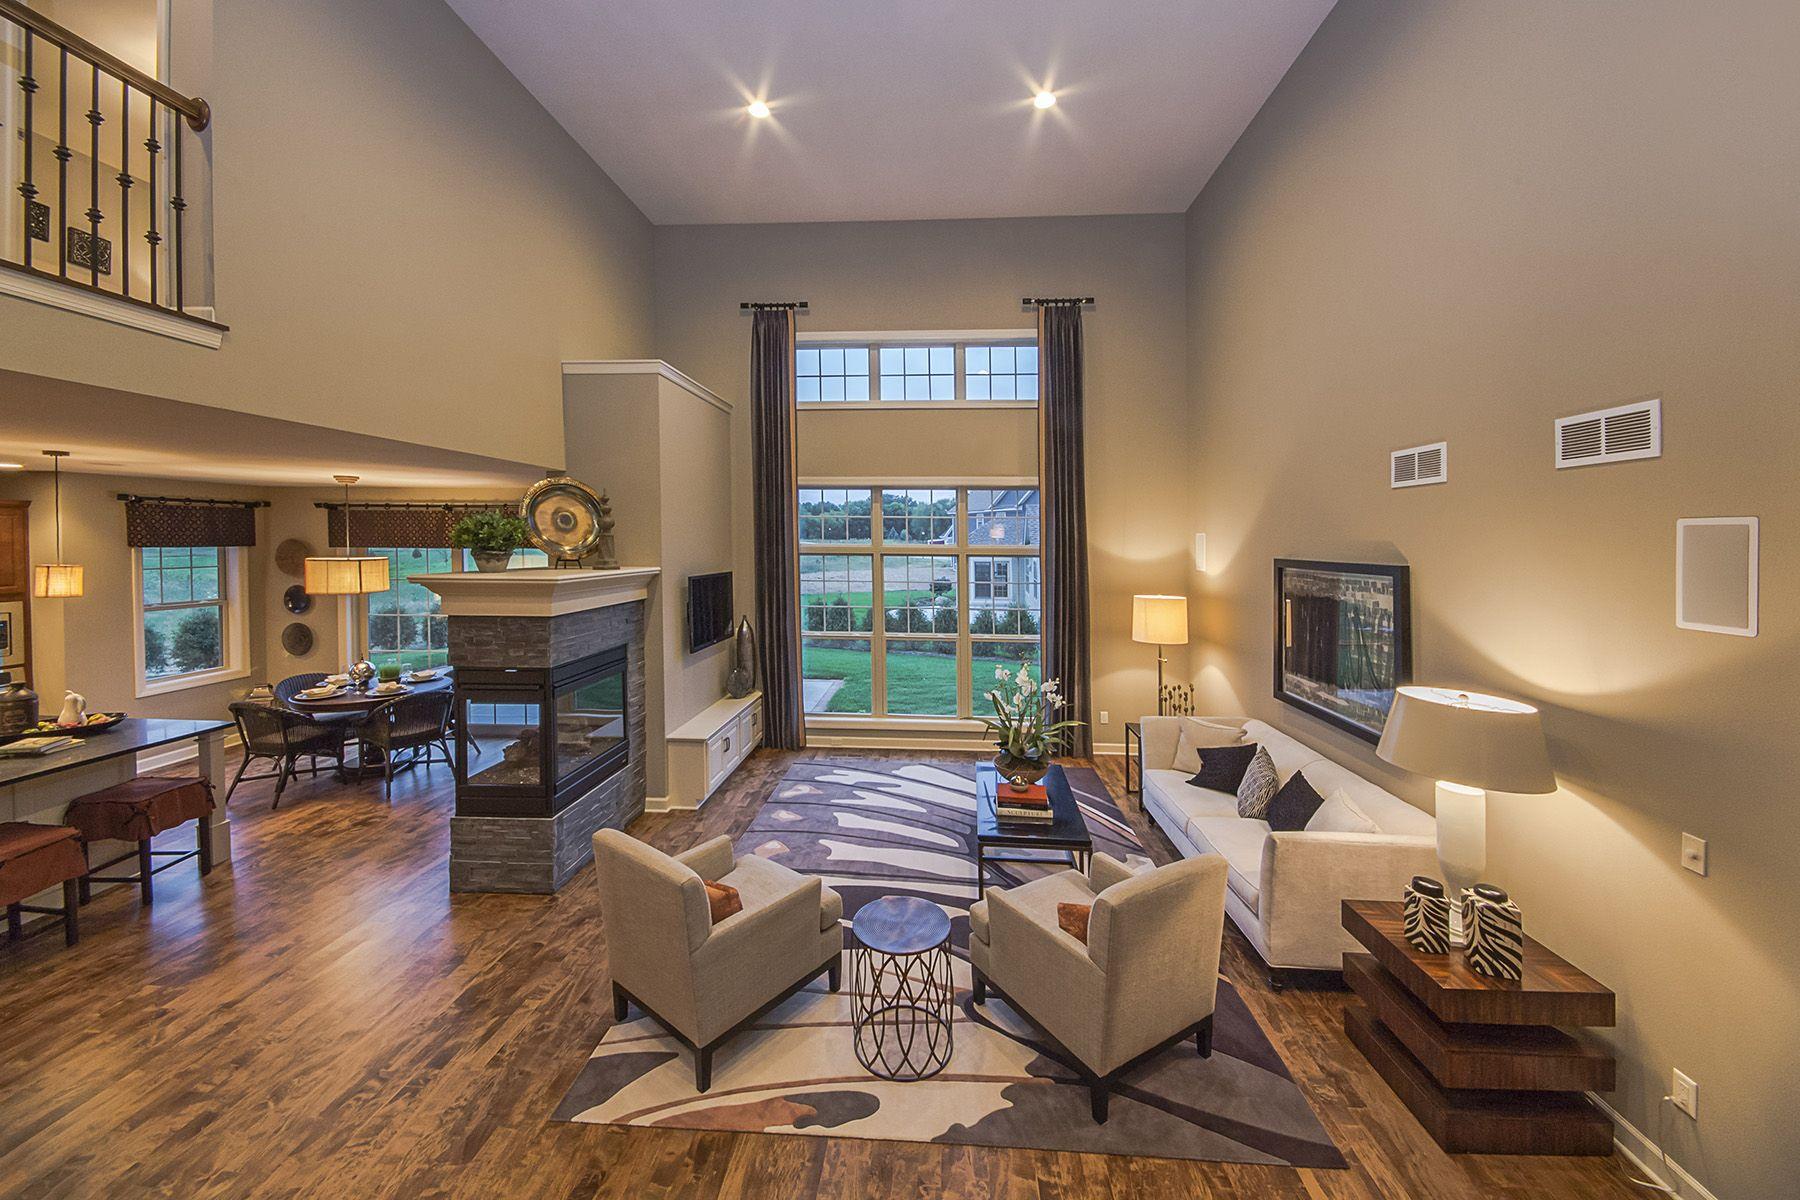 Wisconsin | Wisconsin Communities | Wisconsin, Home Decor, Home on design homes missouri, design homes mo, design homes oregon, design homes nebraska, design homes in mn,